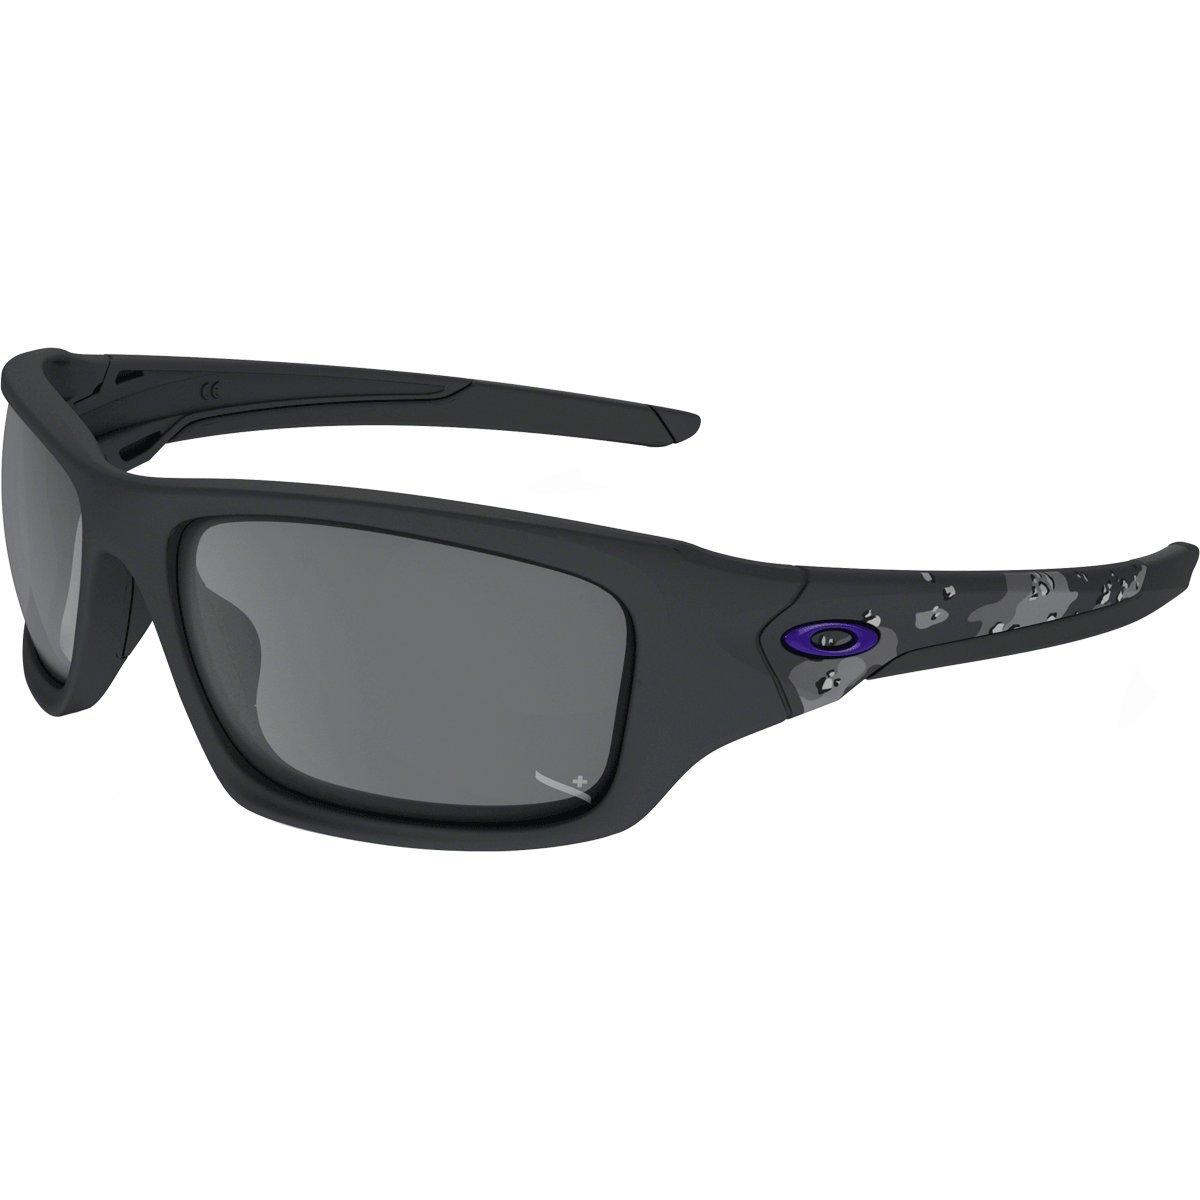 Oakley Men's Valve Rectangular, Carbon, 60 mm by Oakley (Image #1)